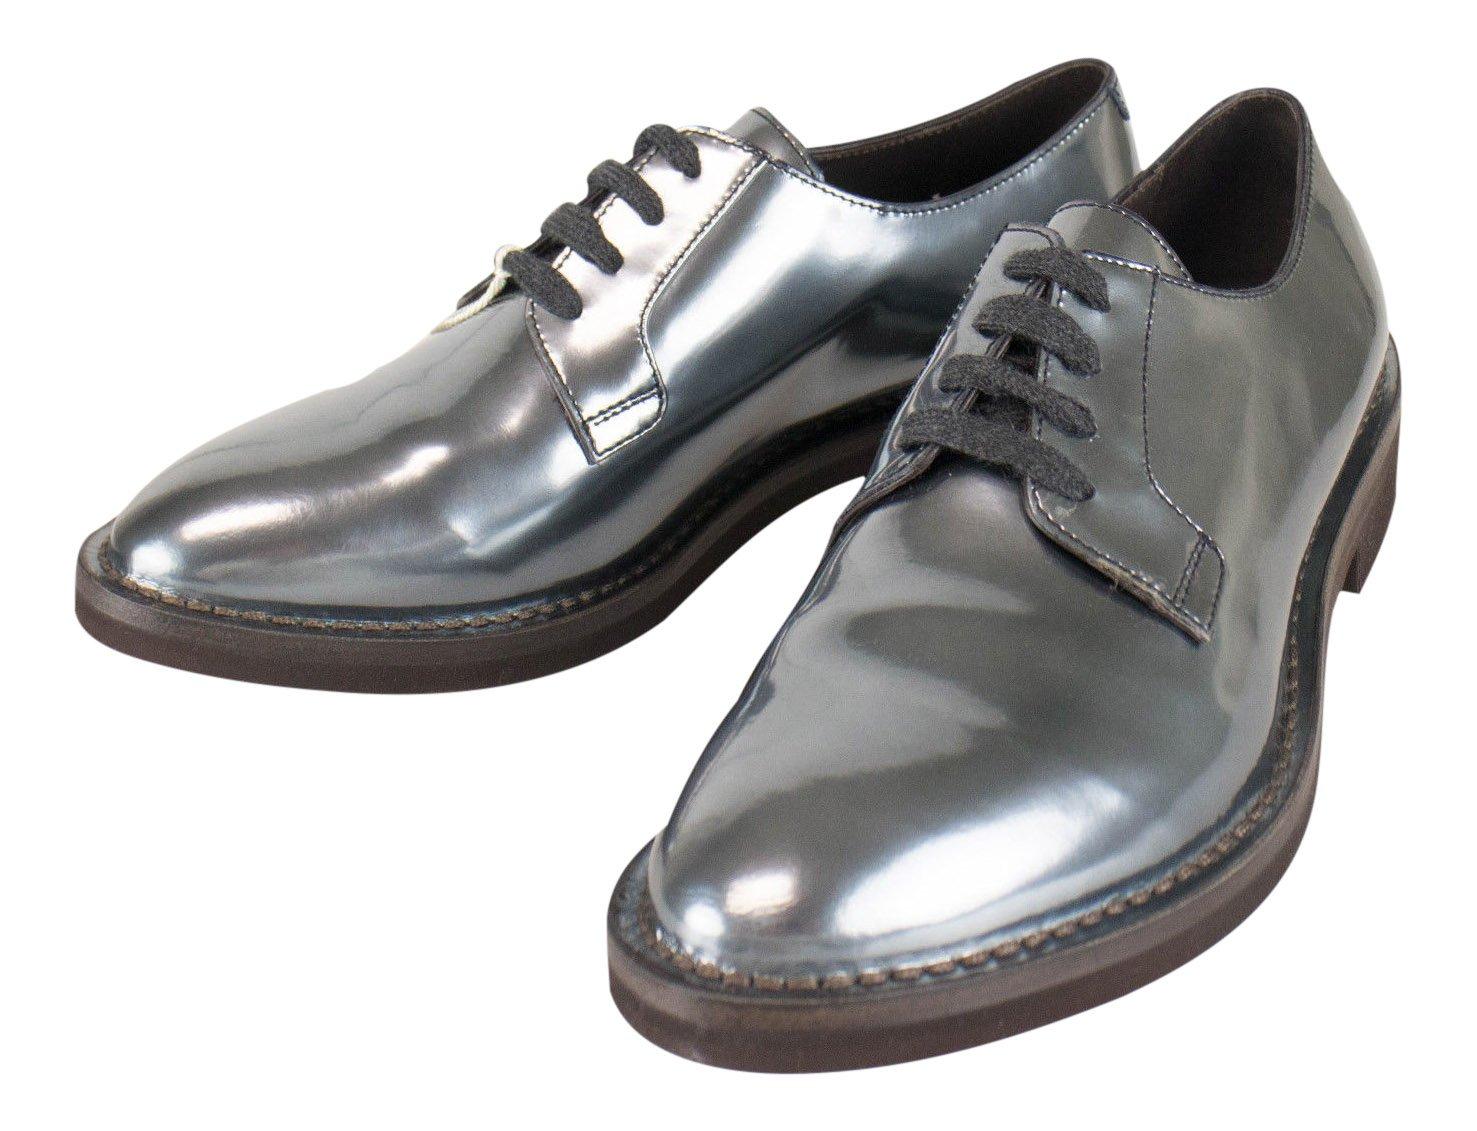 Brunello Cucinelliグレーパテントレザーオックスフォード靴サイズ38.5 / 8.5   B01N6Q39J7